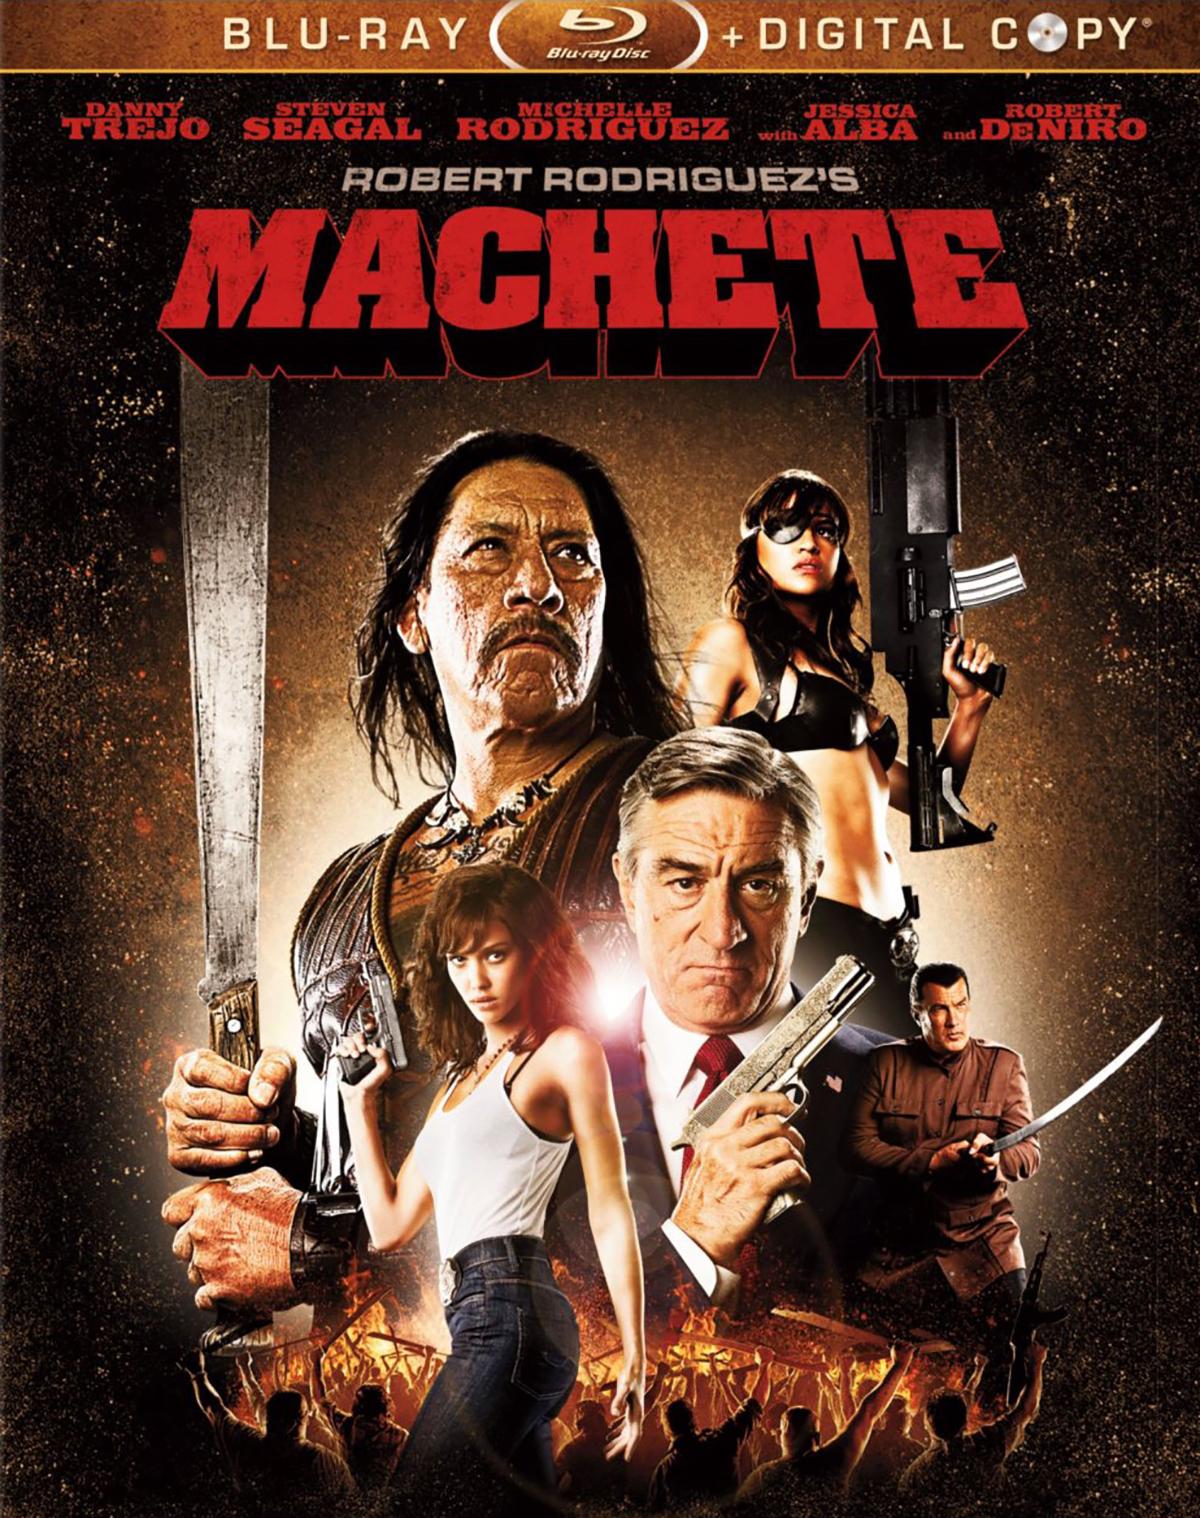 An Erotic Werewolf In London blu-ray review: machete - slant magazine